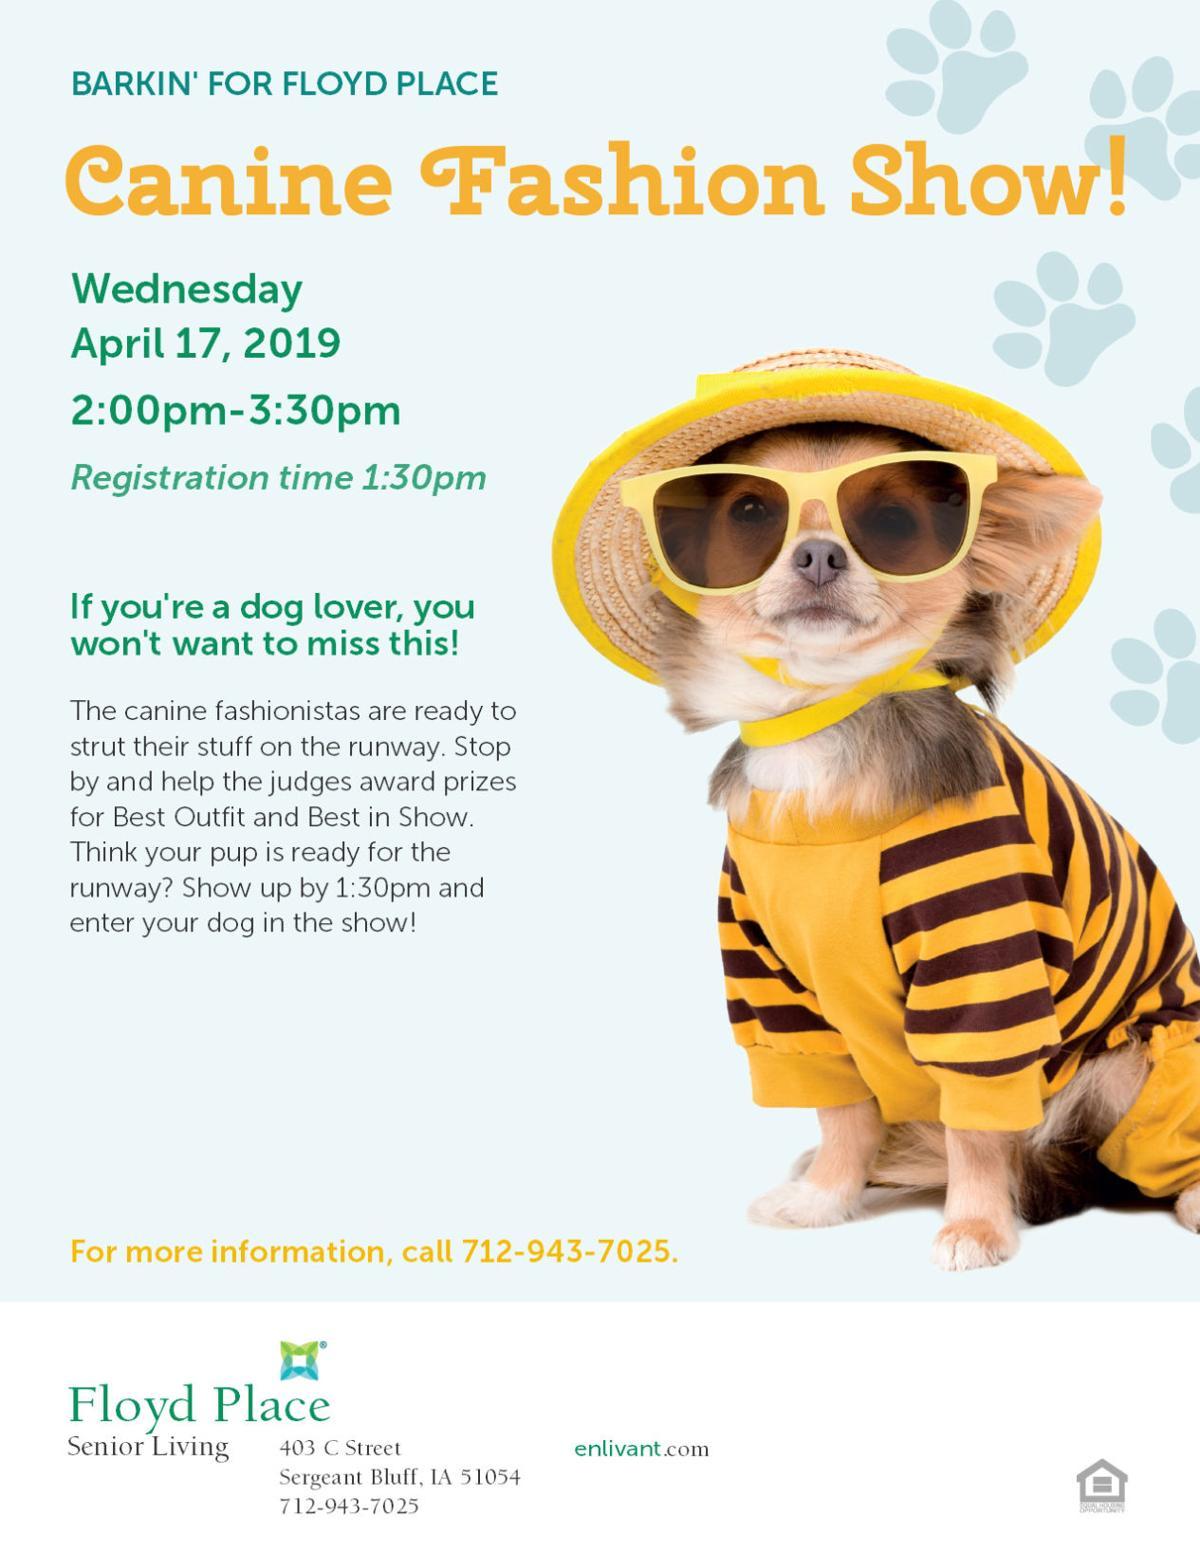 Floyd Place Canine Fashion Show